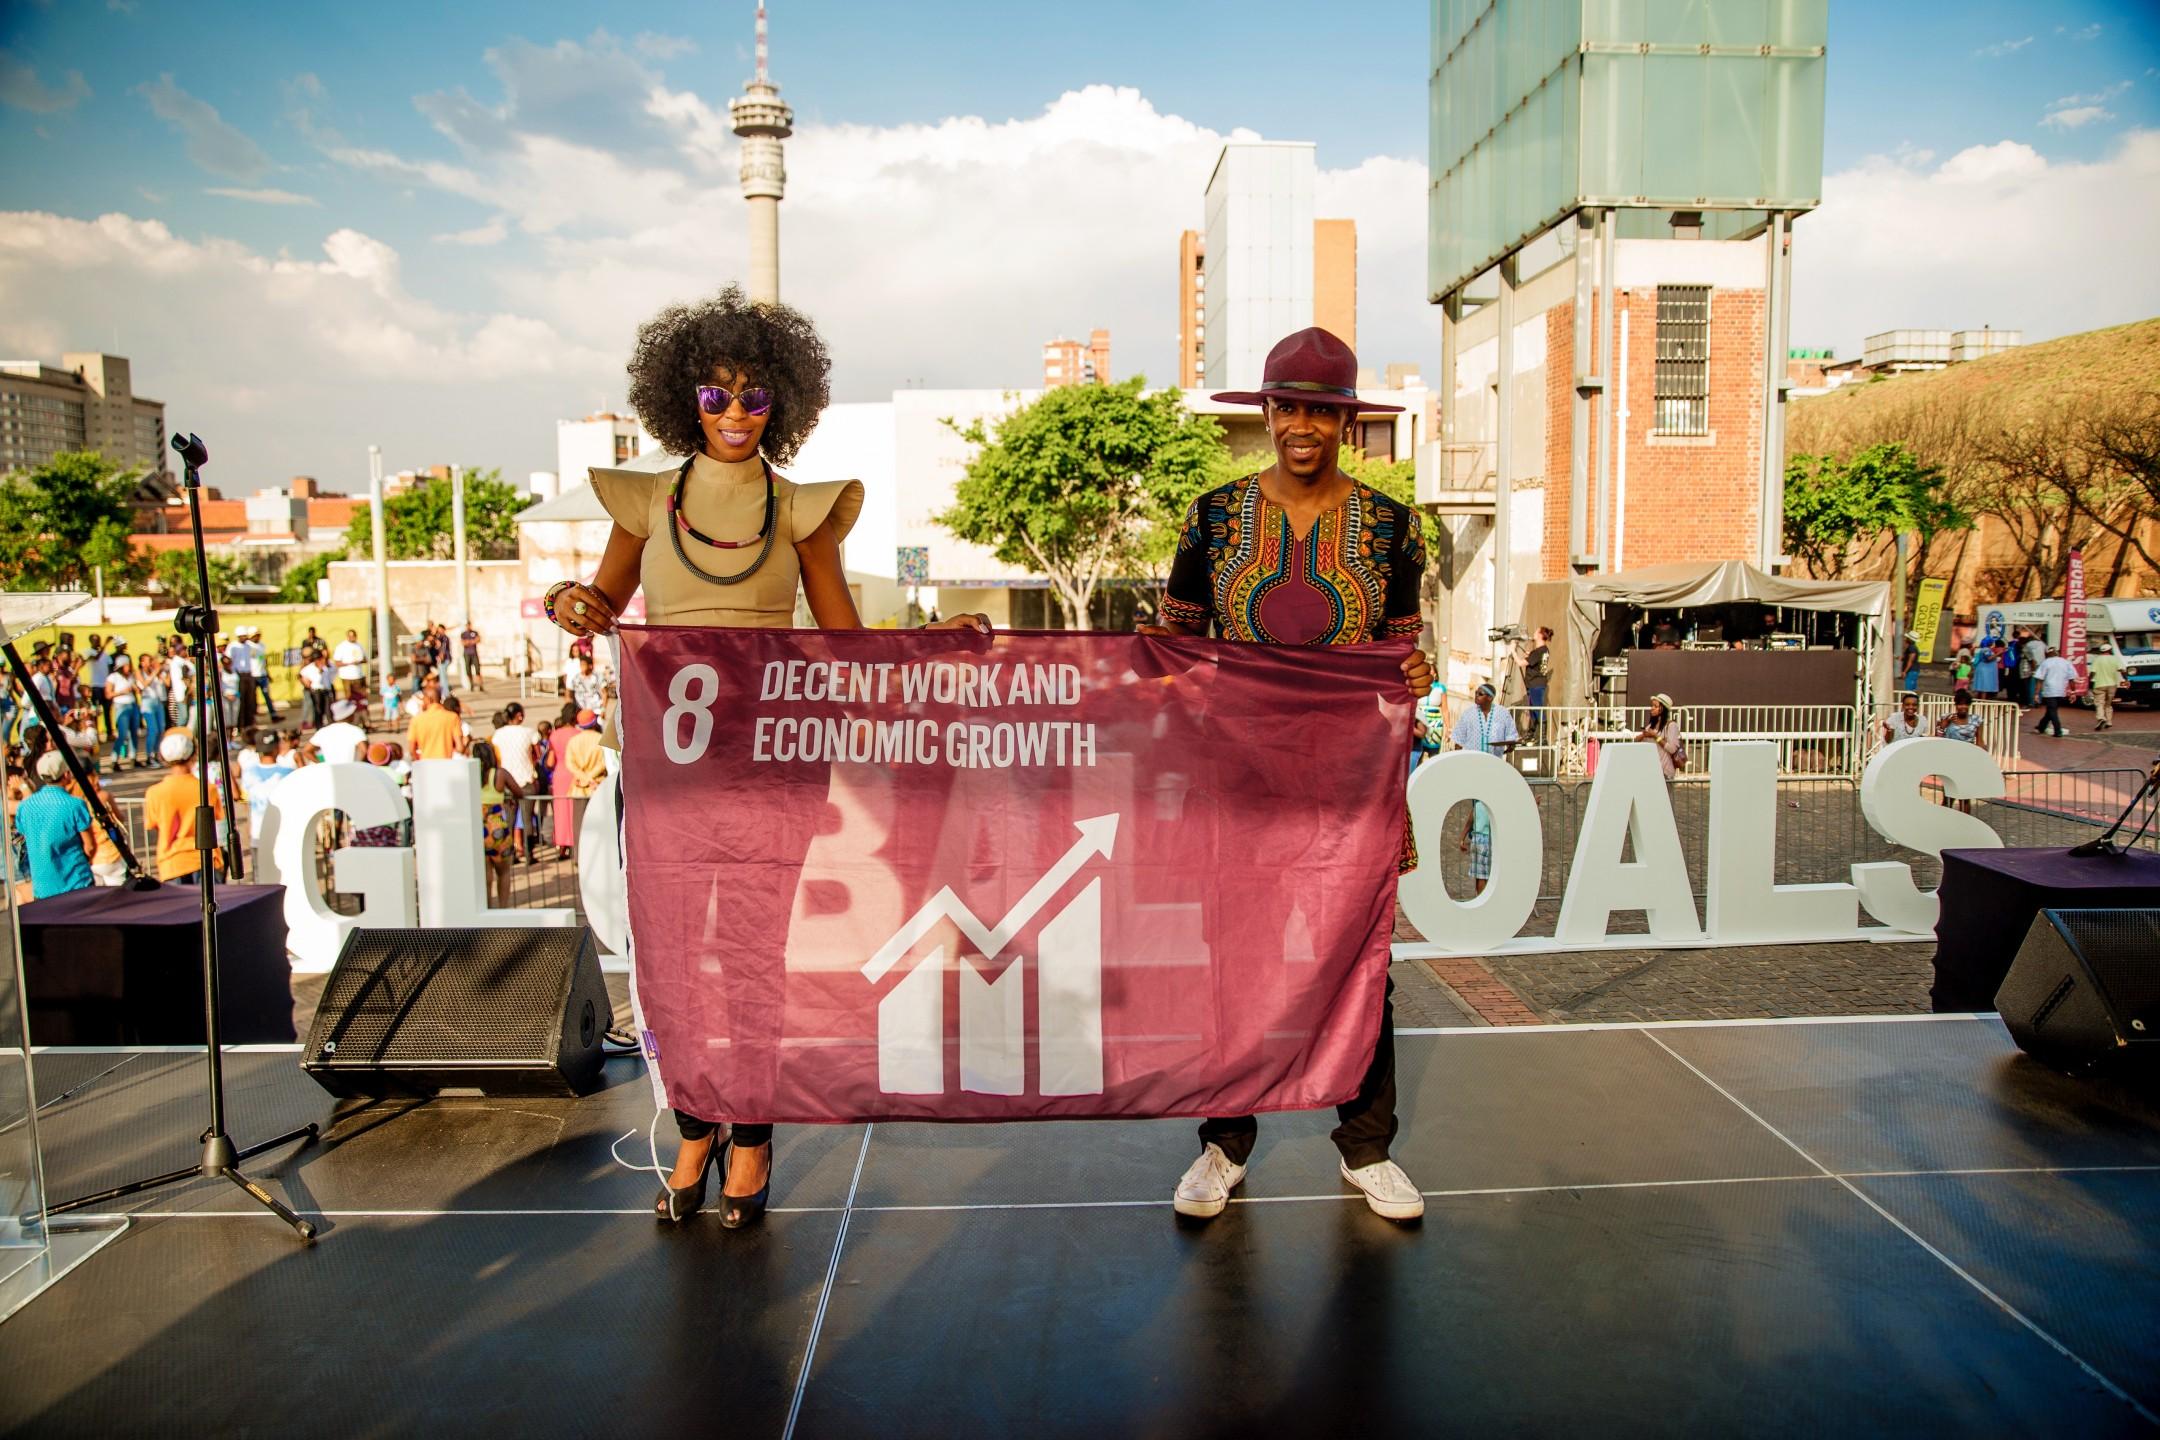 global-goals-mafikizolo-raised-a-flag-in-johannesburg-south-africa.jpg